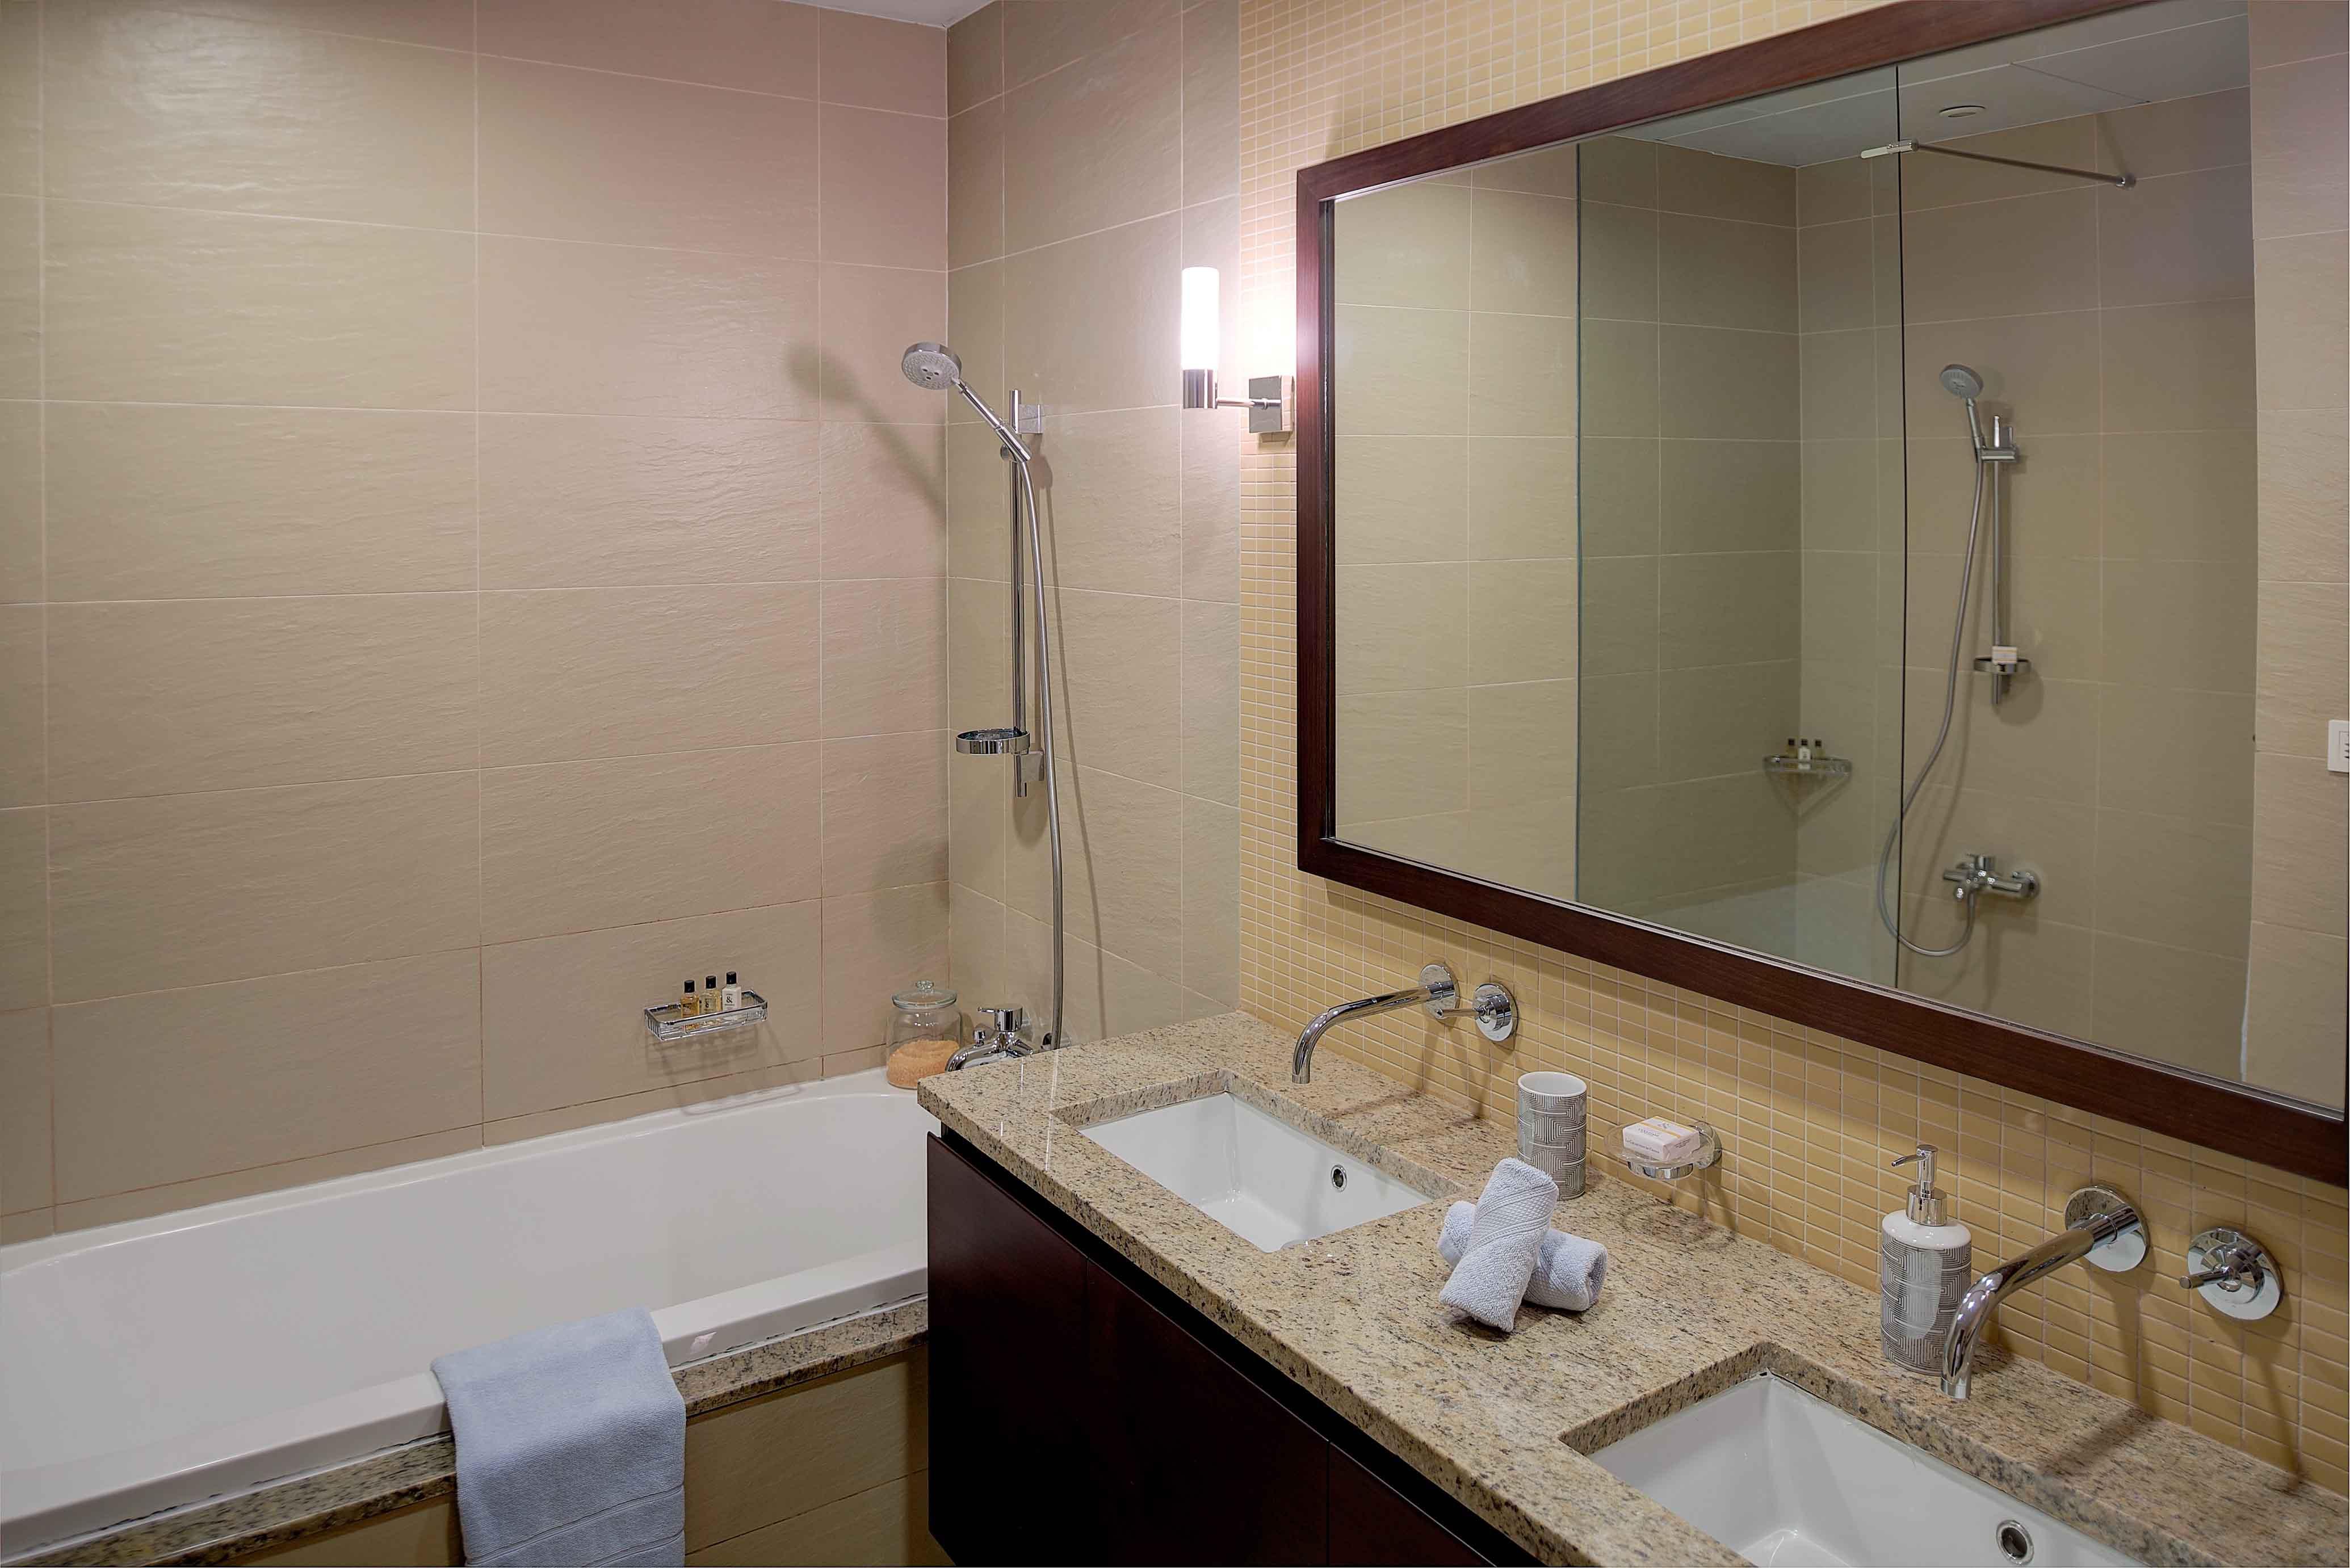 Bathroom at Tiara Tower Apartments